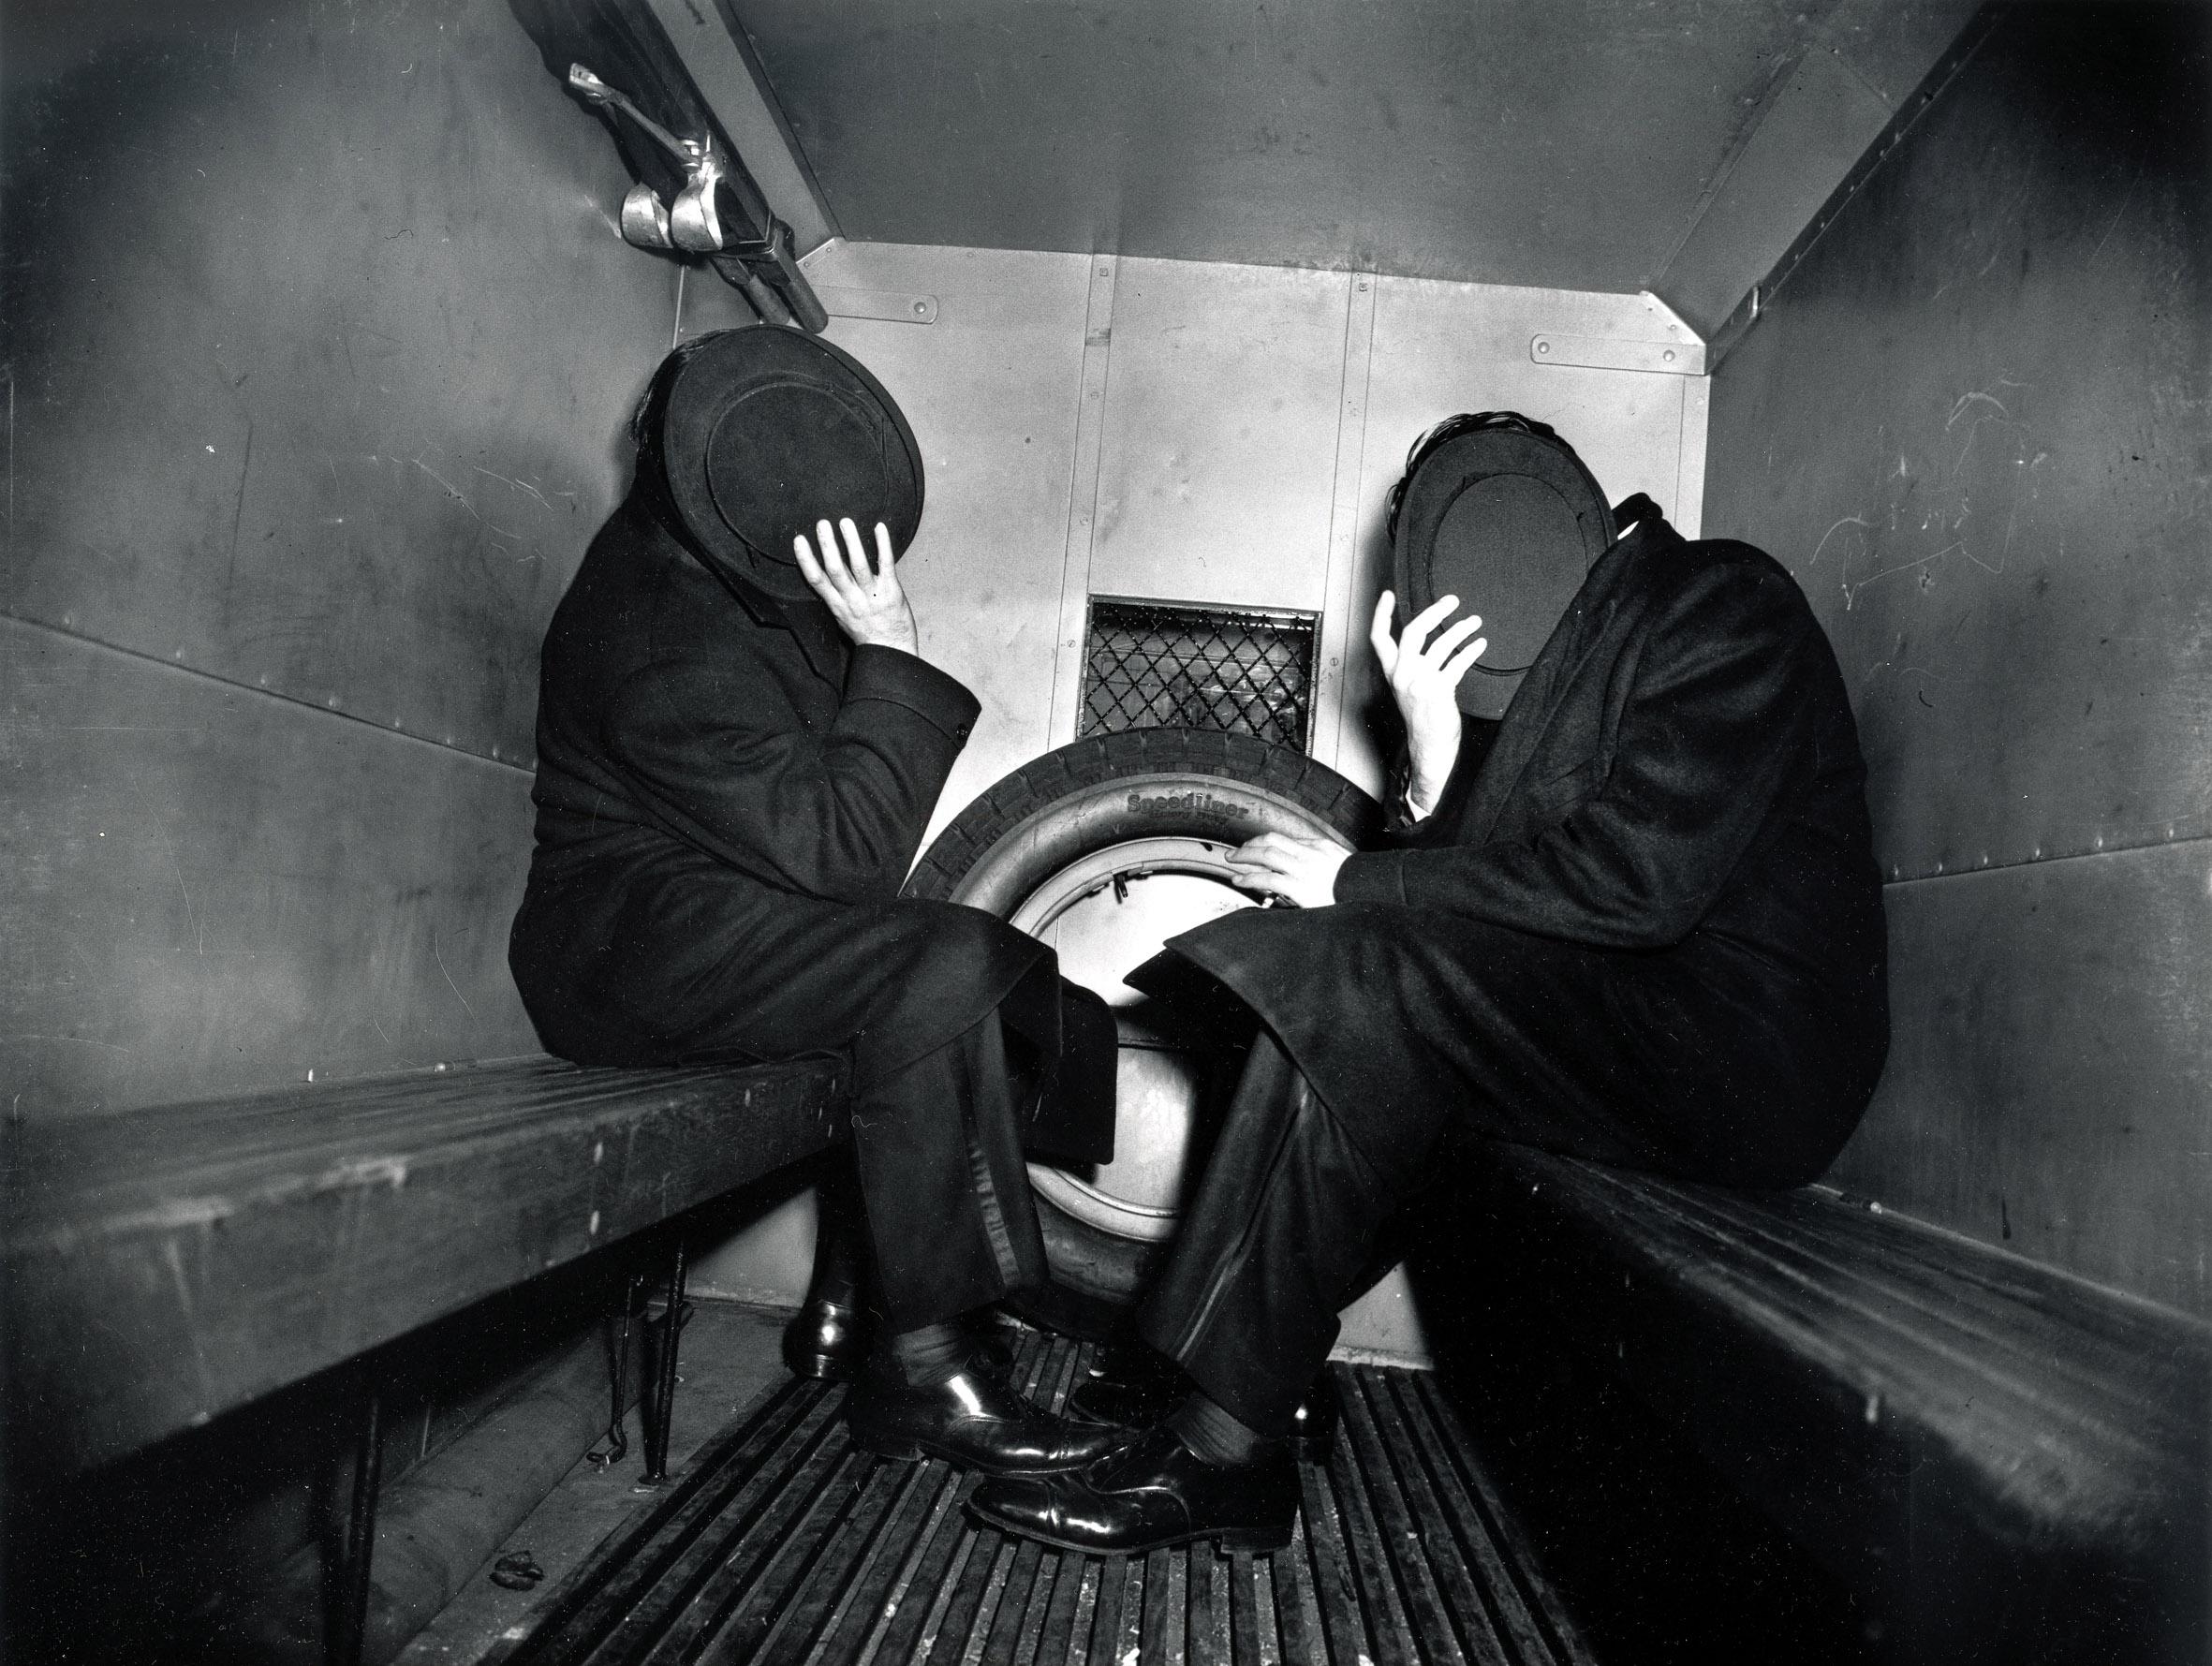 Fotó: Weegee: A rabszállítóban, 1942. január 27. © Courtesy Institute for Cultural Exchange, Germany 2018